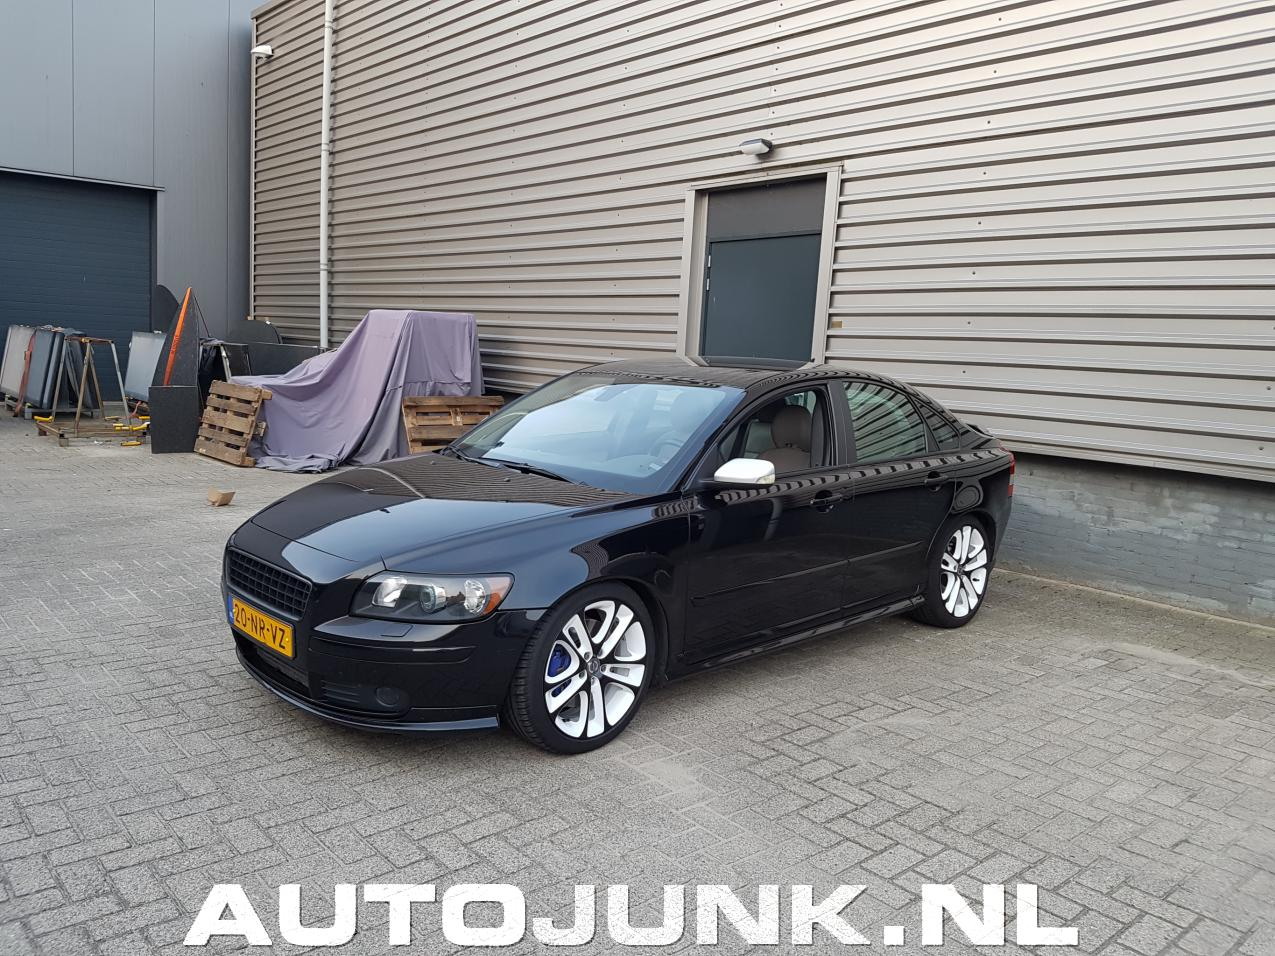 Volvo S40 T5 Met Nieuwe Sloffen Fotos Autojunknl 170793